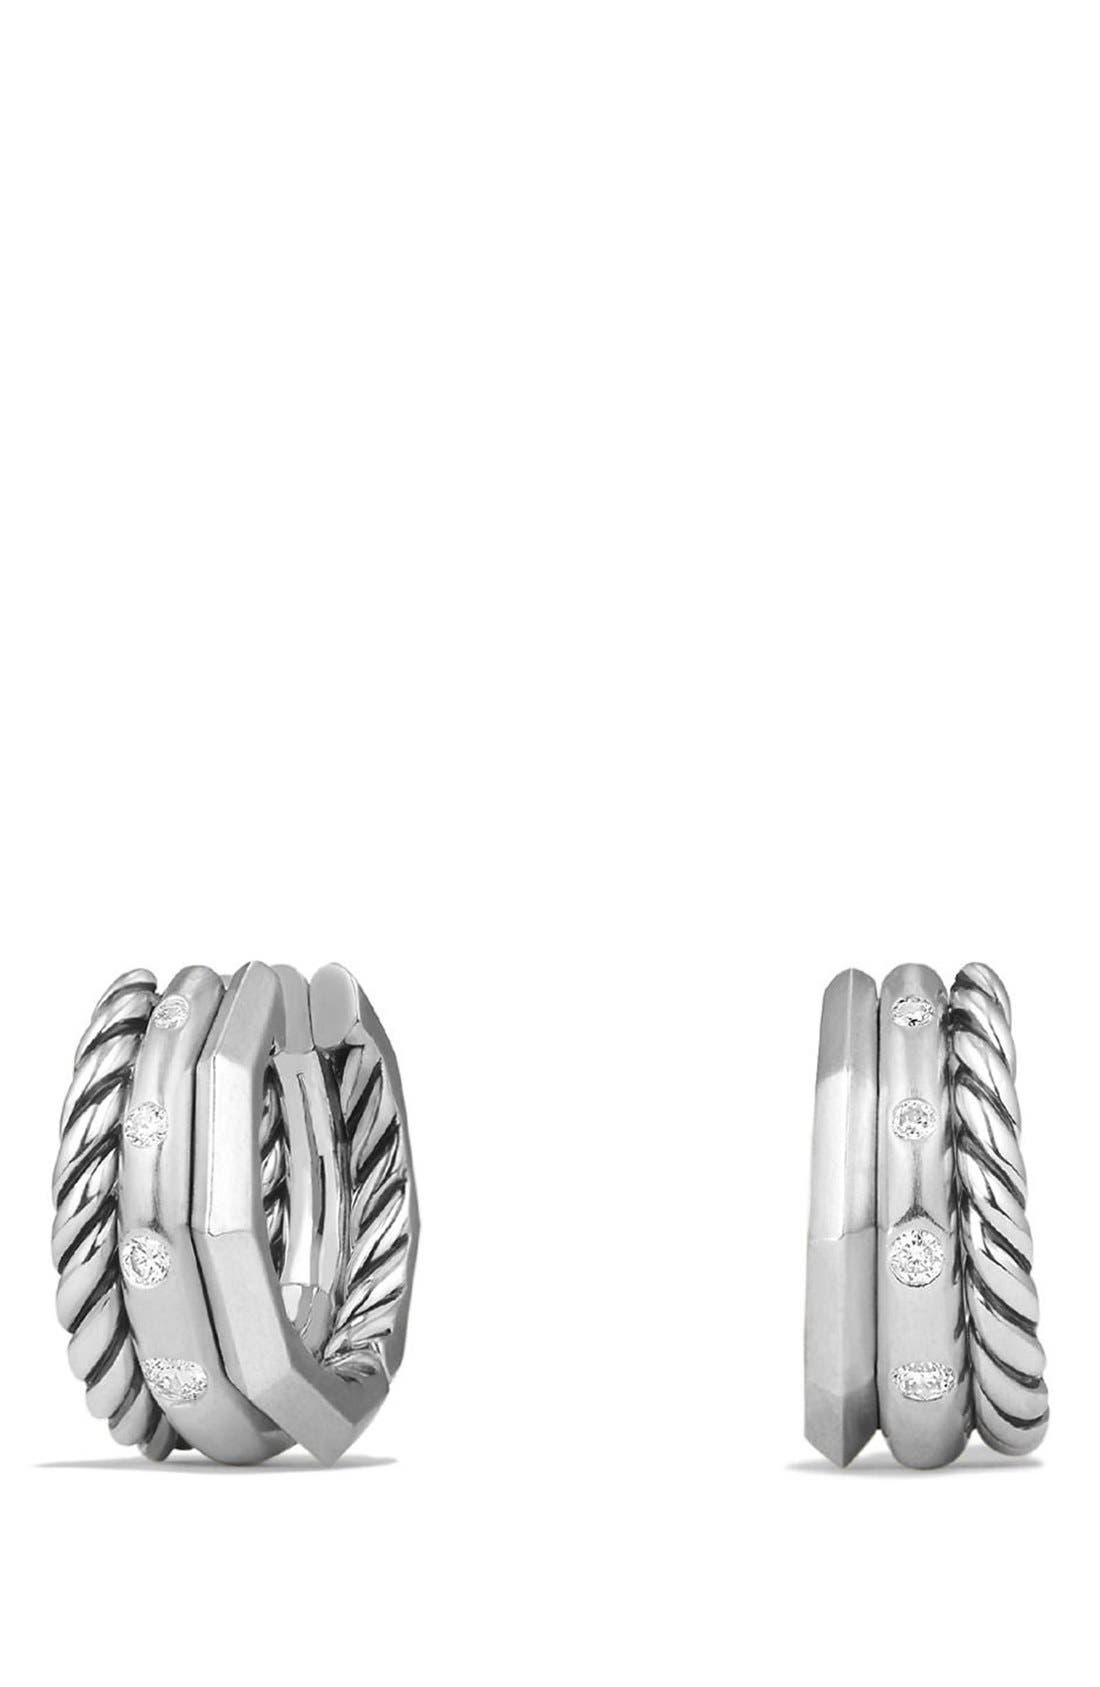 DAVID YURMAN Stax Diamond Hoop Earrings